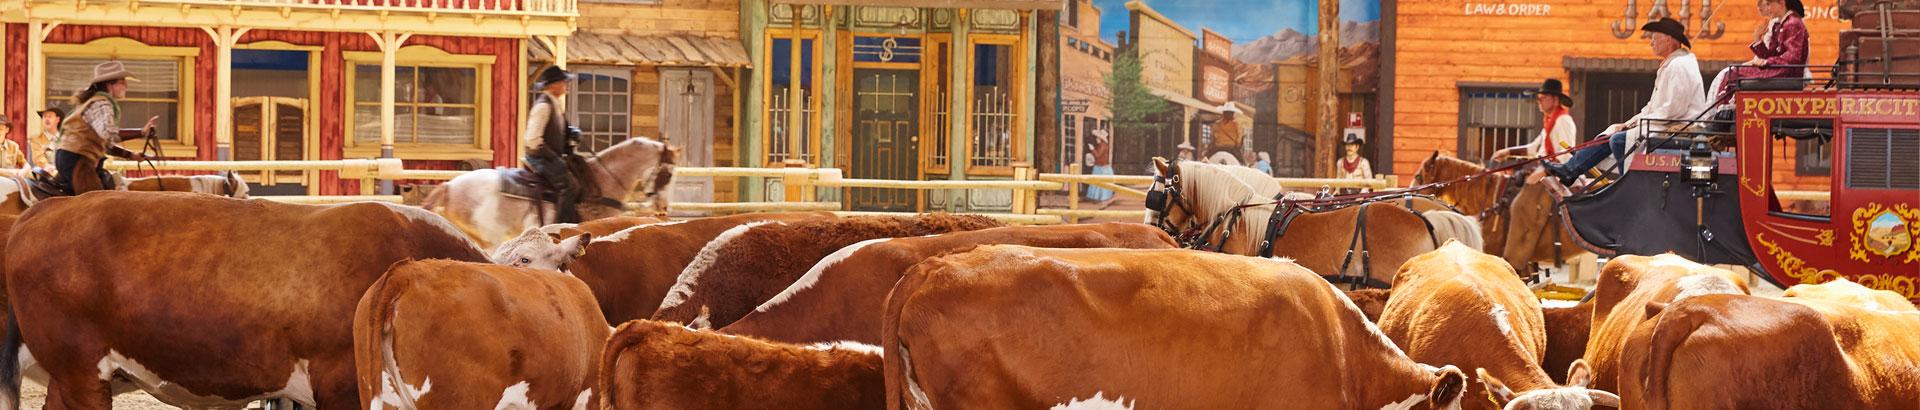 Cowboyshow2